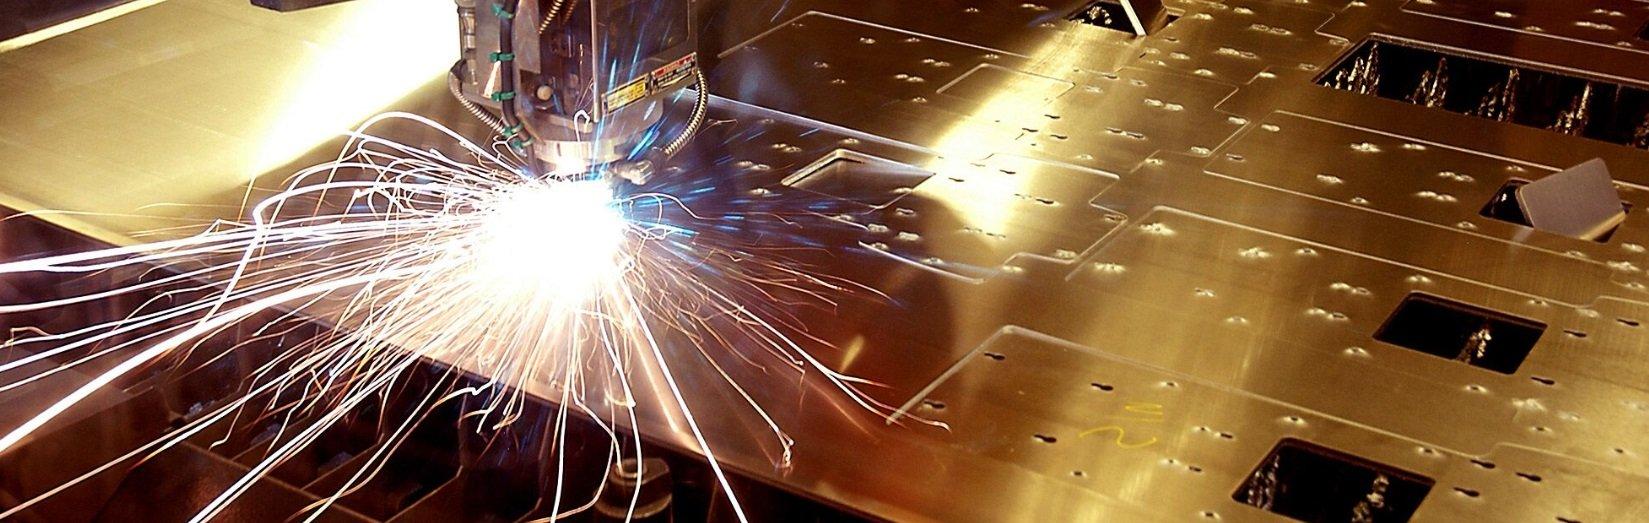 Workshop Machinery Supplier for Sale – $8m + Sales & Very Profitable Melbour